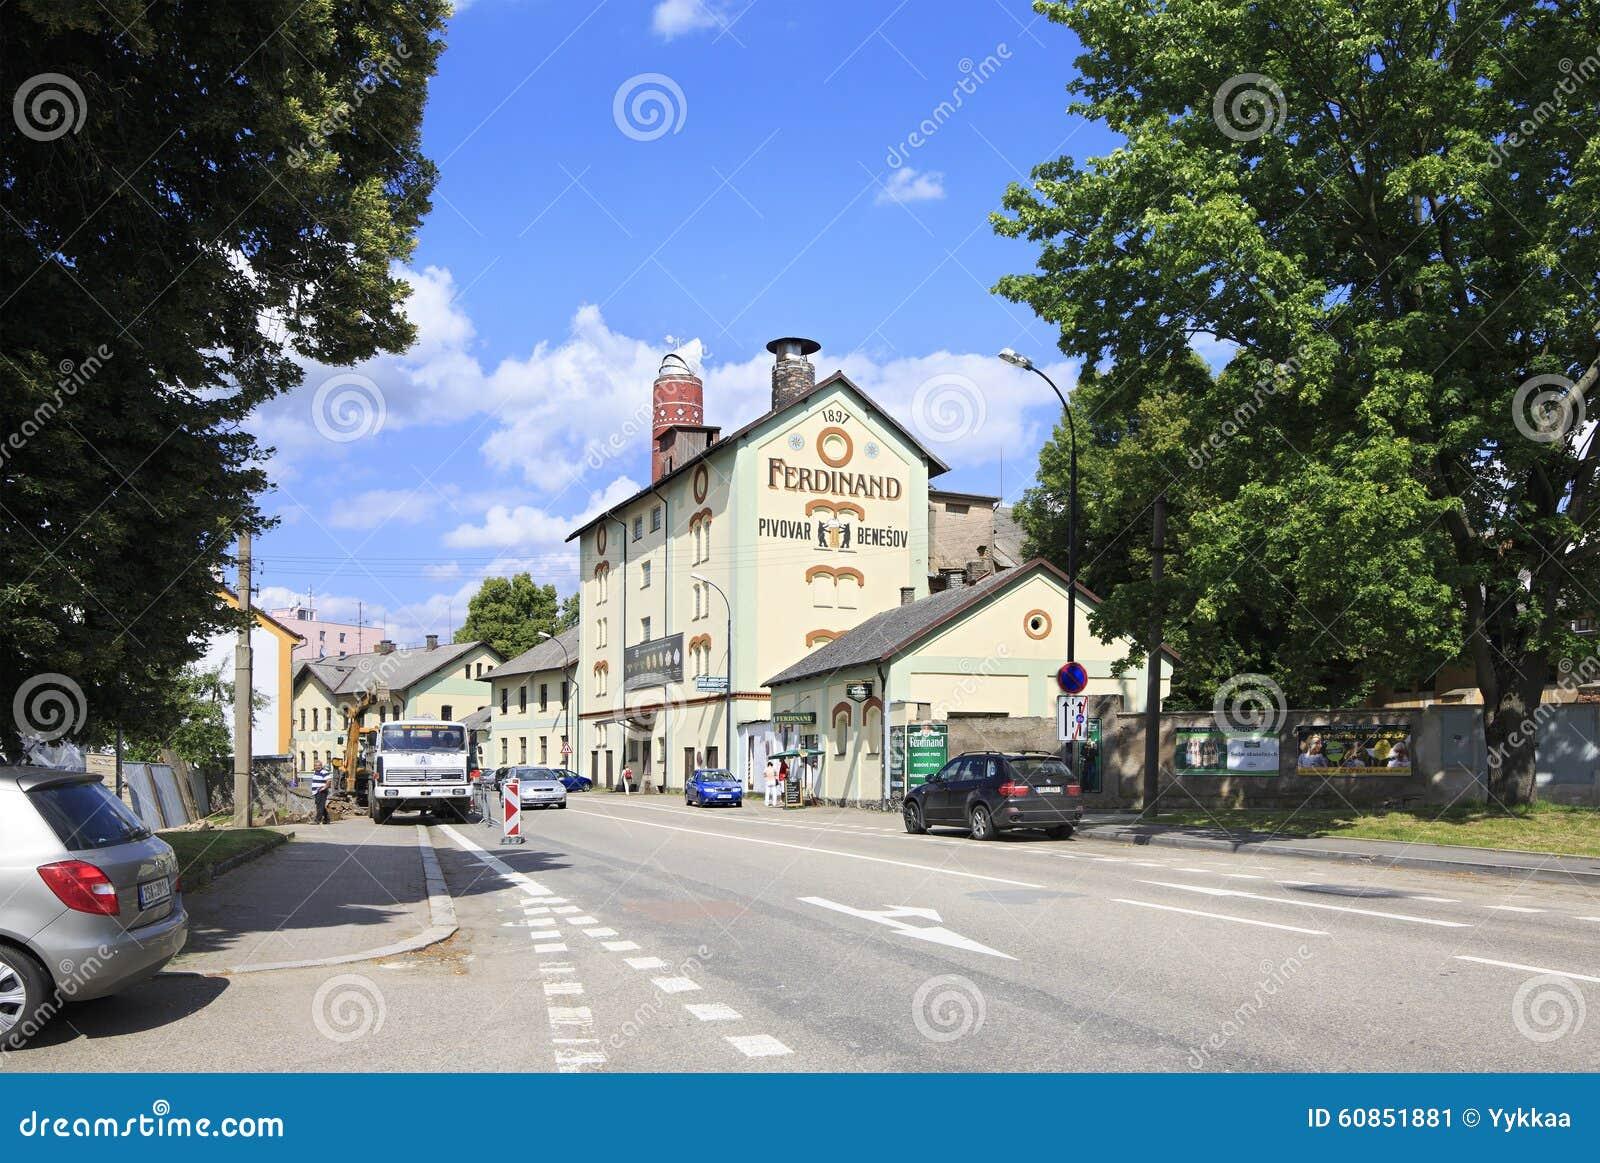 Ferdinand Brewery in Benesov